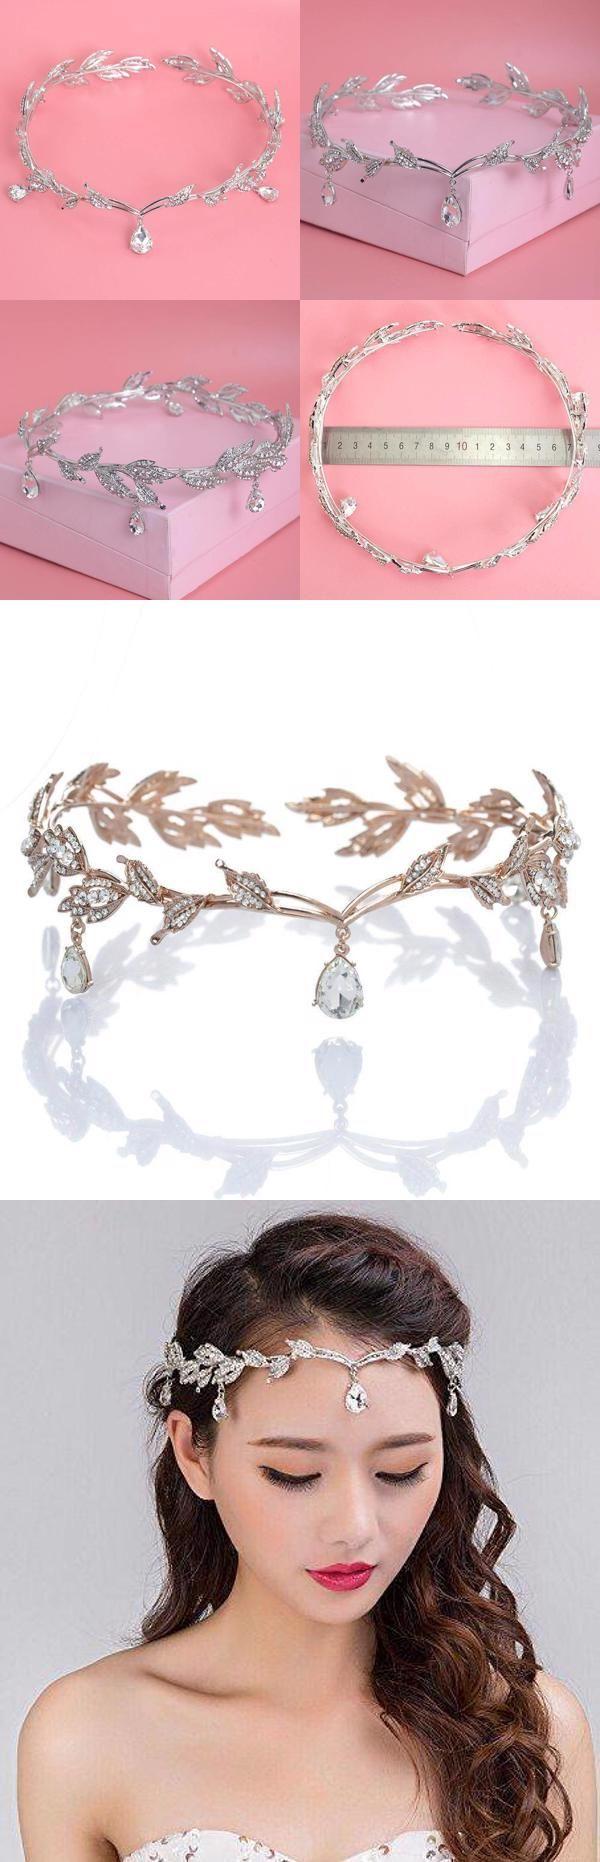 Crystal Crown Tiara, Water drop Leaf Headband, Luxury Hair accessory, Good for Bridals, Prom, Princess, Pageant, Wedding #crowntiara